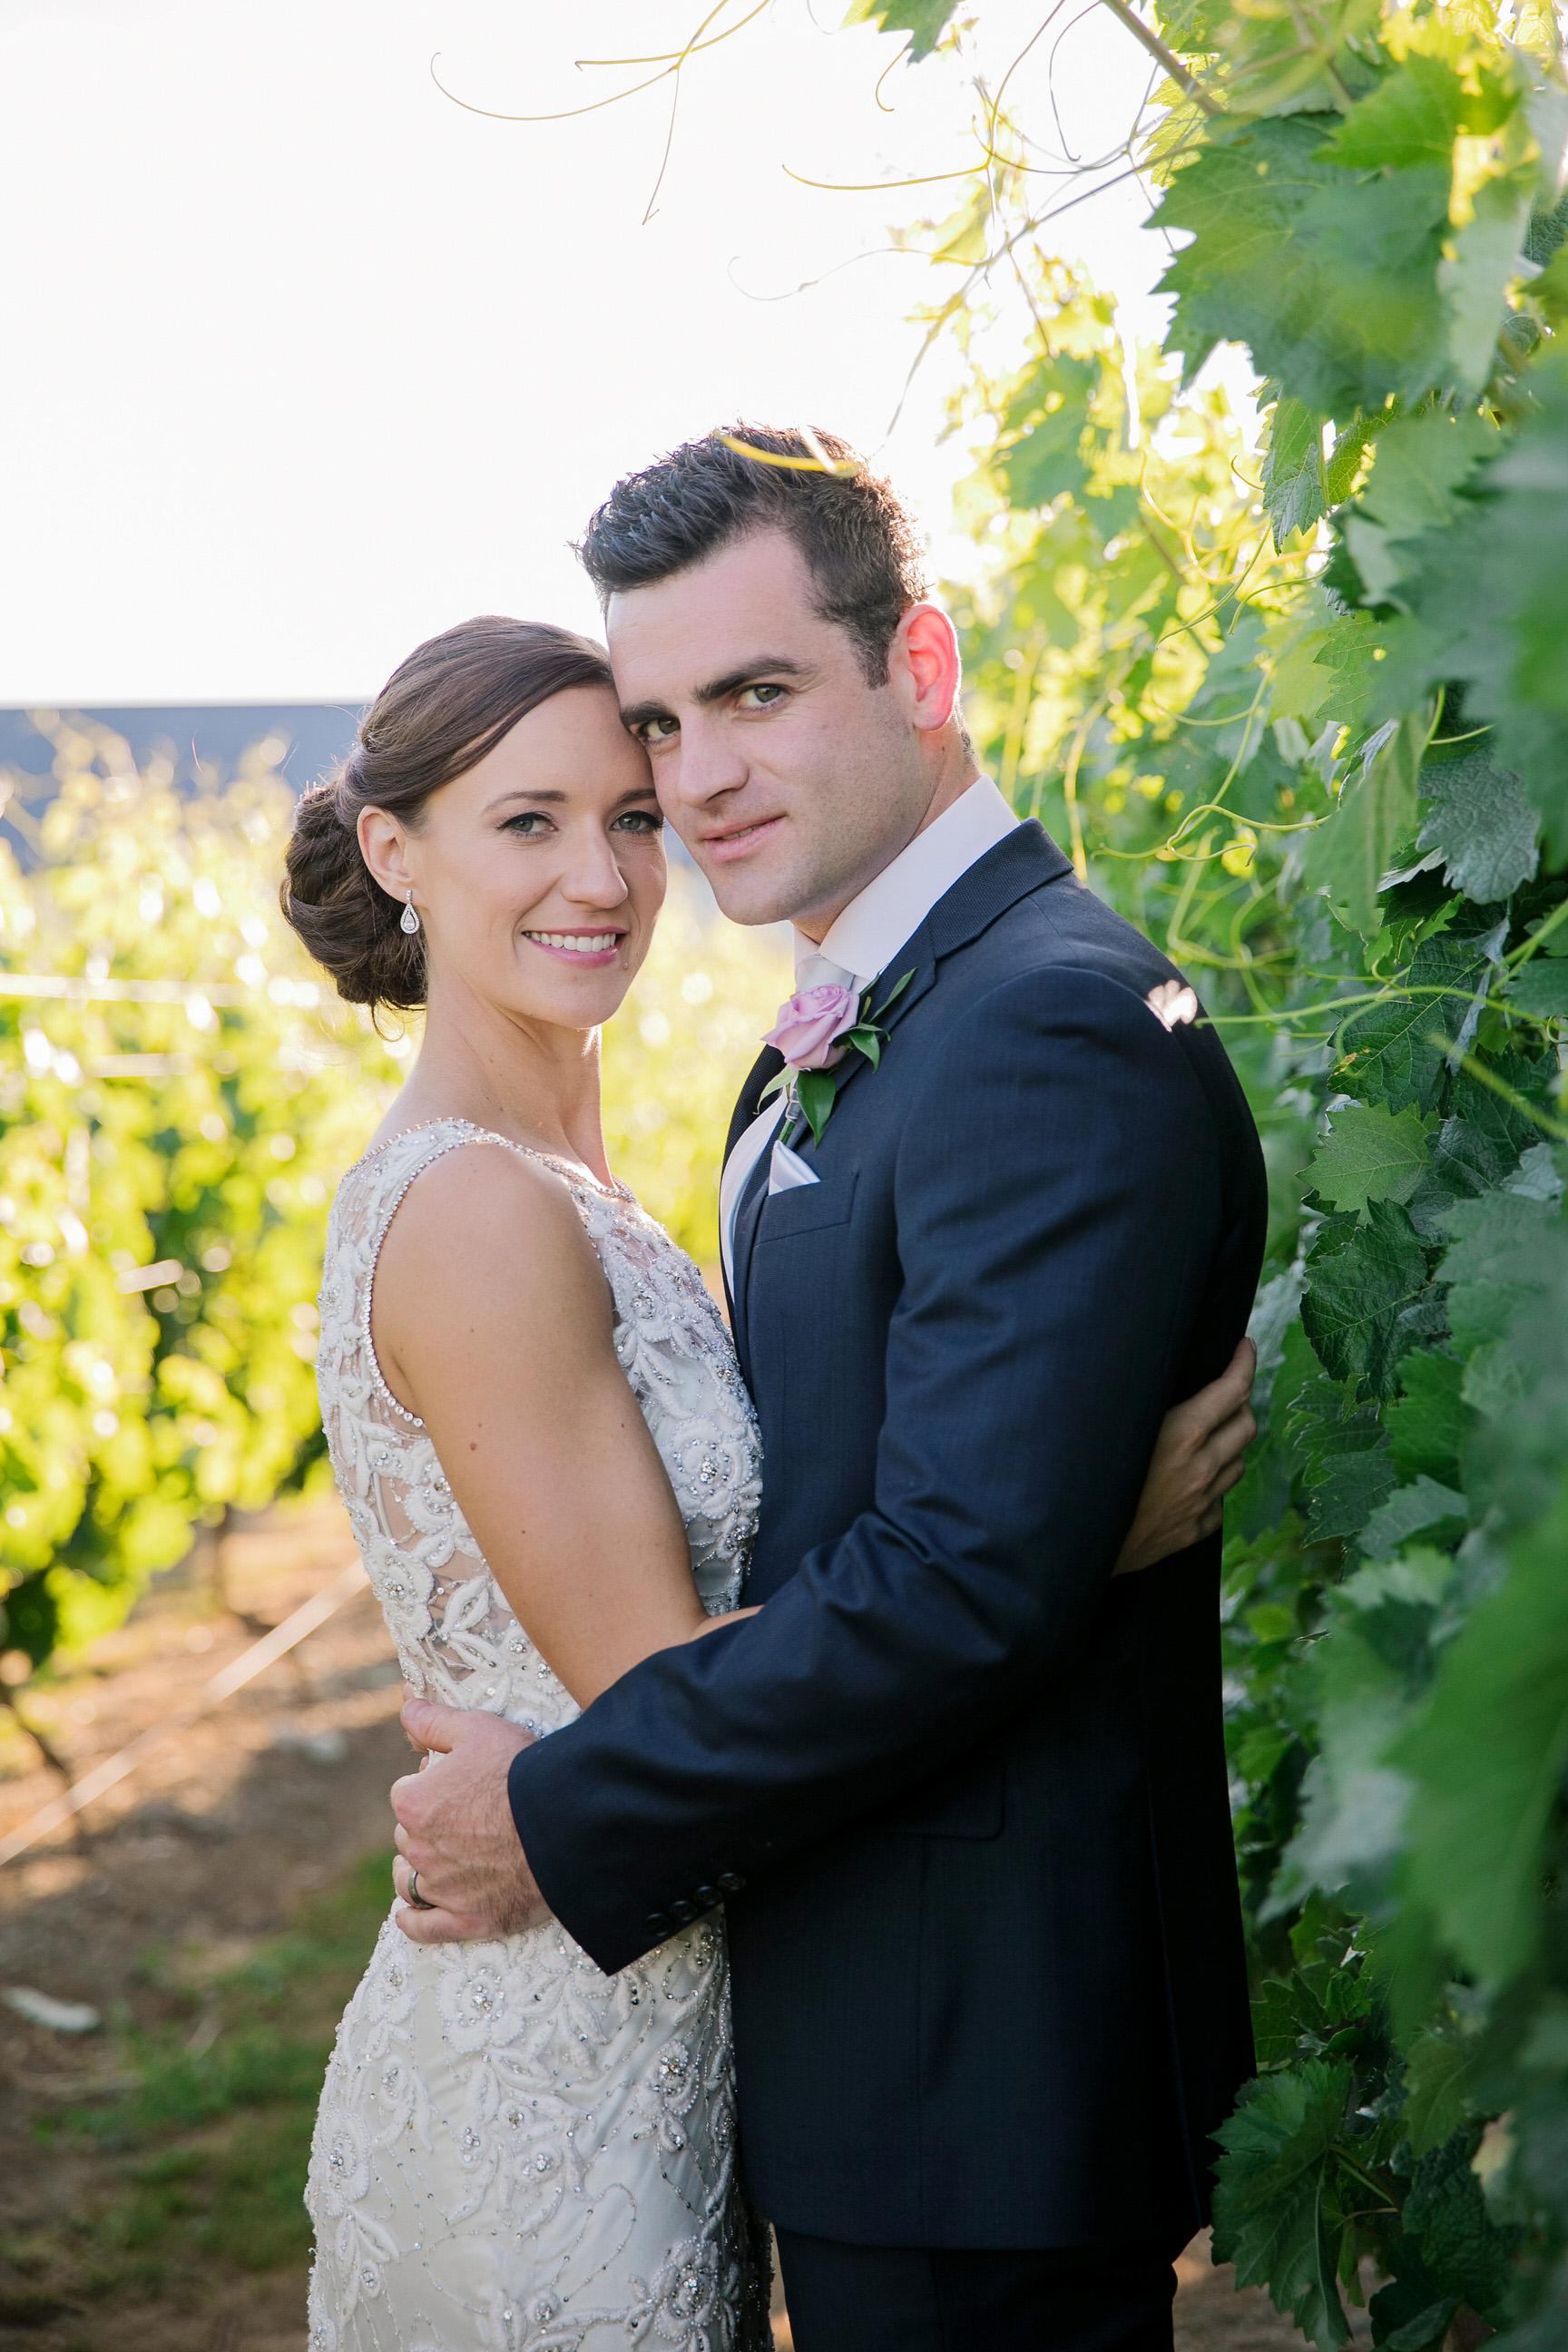 Martinborough-Poppies-Wedding-Caine-Eloise-Toni-Larsen-0113.jpg